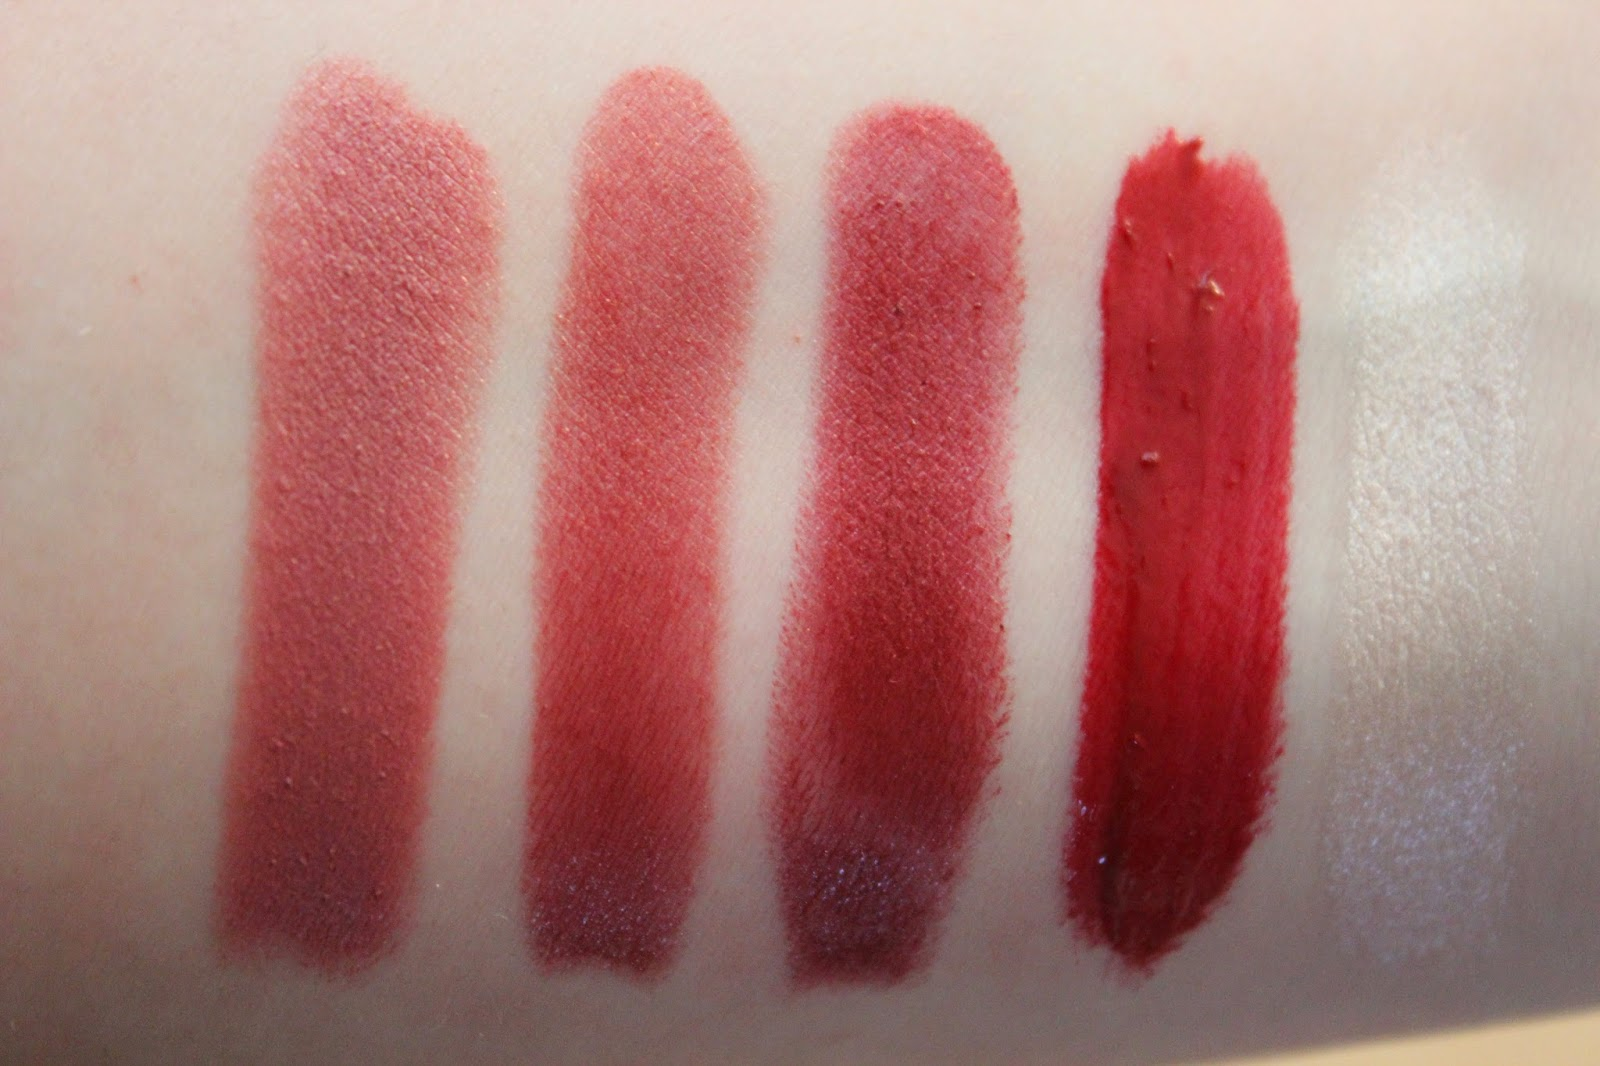 Christina Martina Ulta Collection Lipstick Swatches And